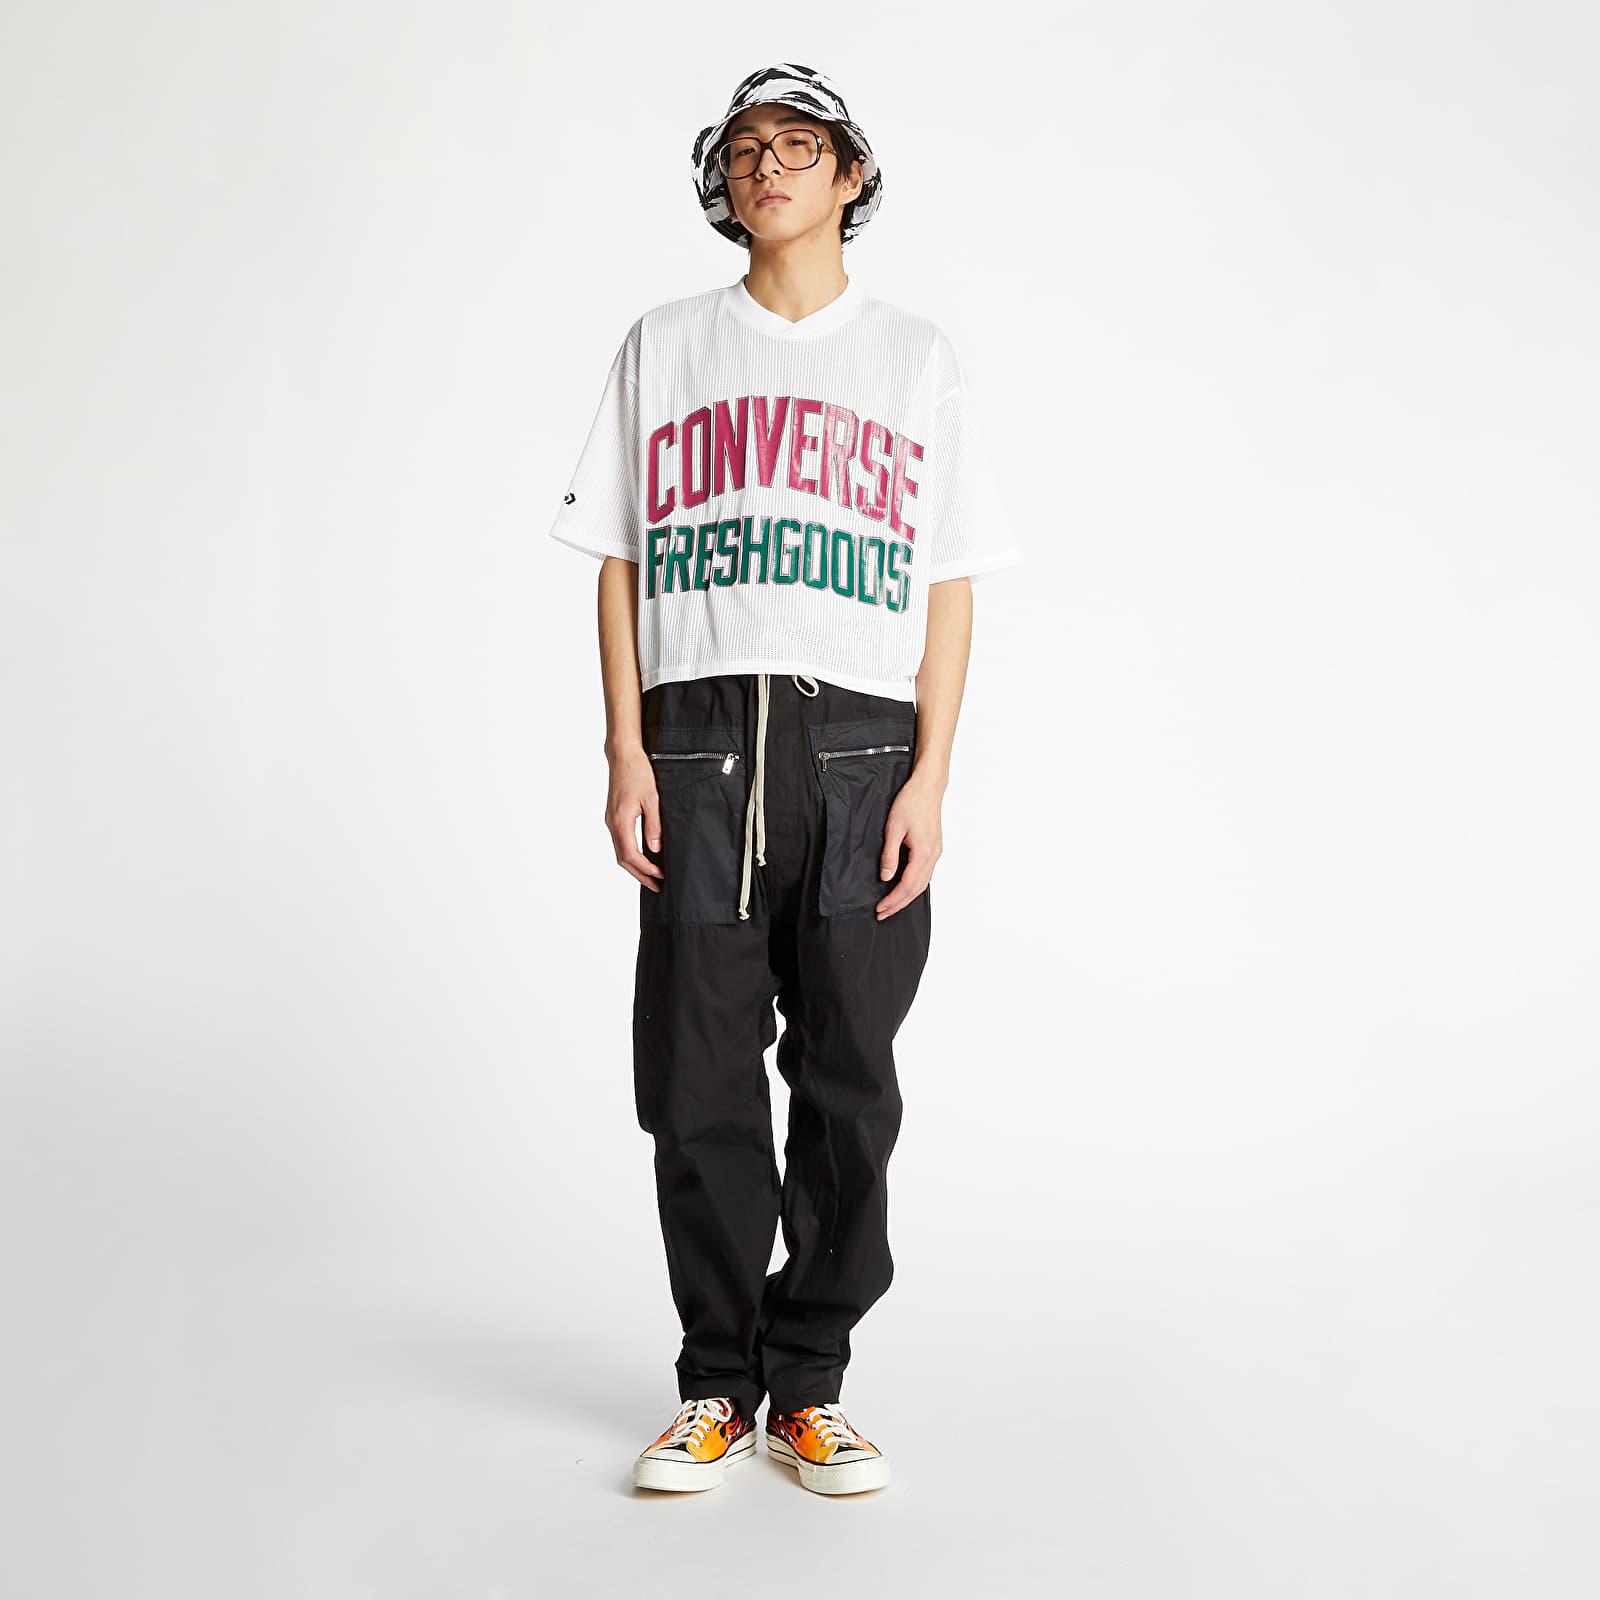 T-shirts Converse x Joe Fresh Goods Football Top White